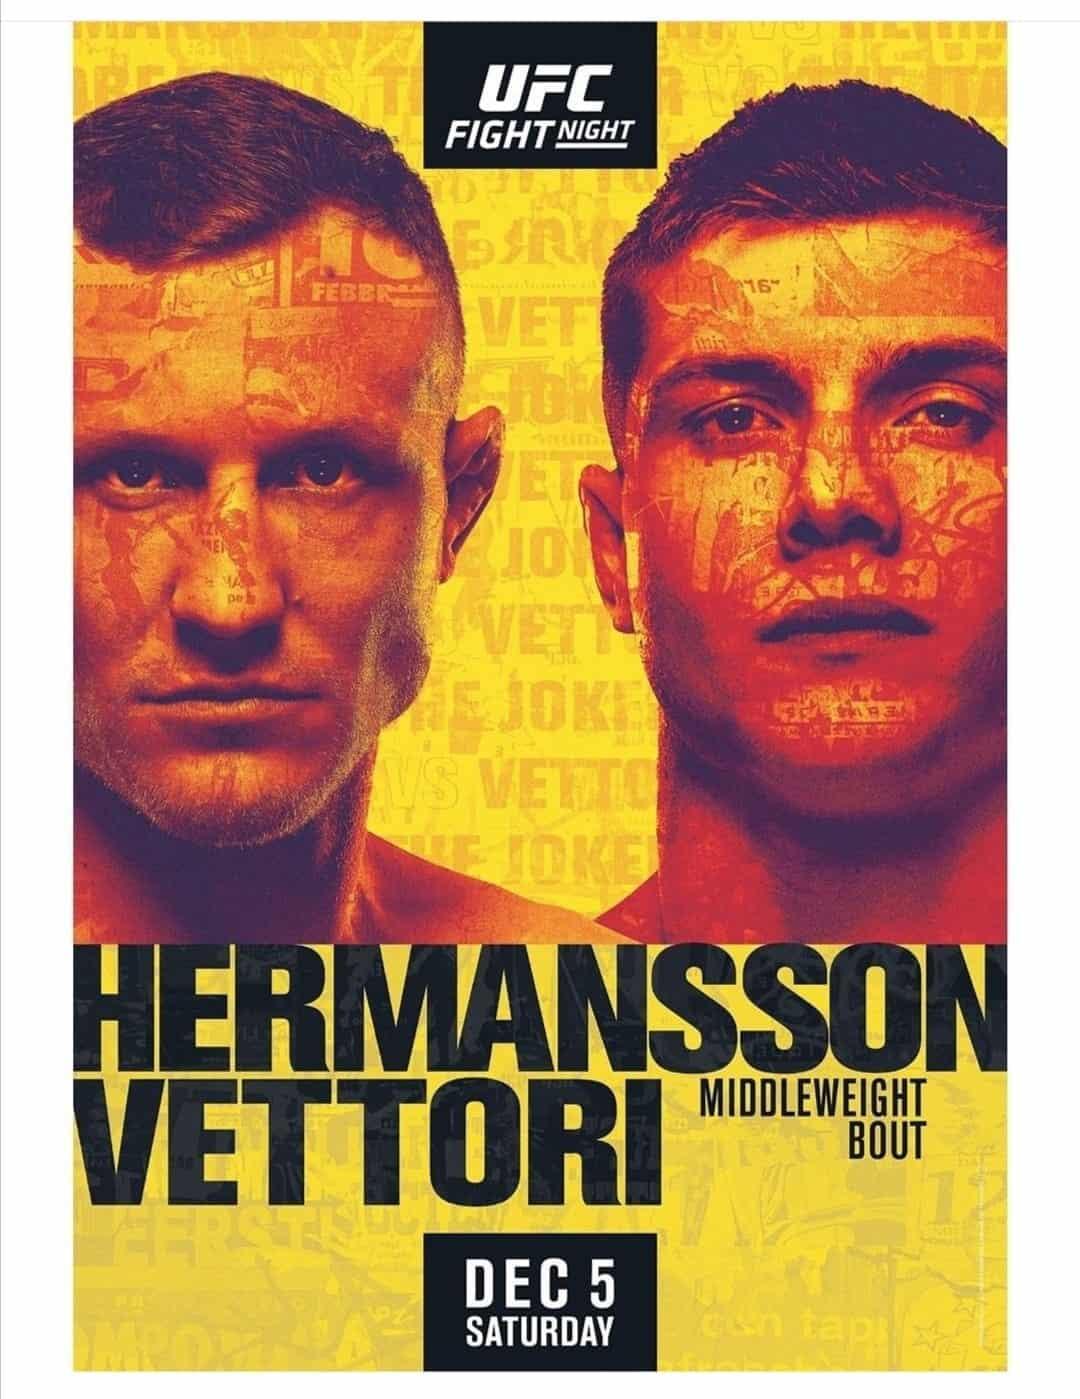 UFC on ESPN 19: Hermansson vs. Vettori 1